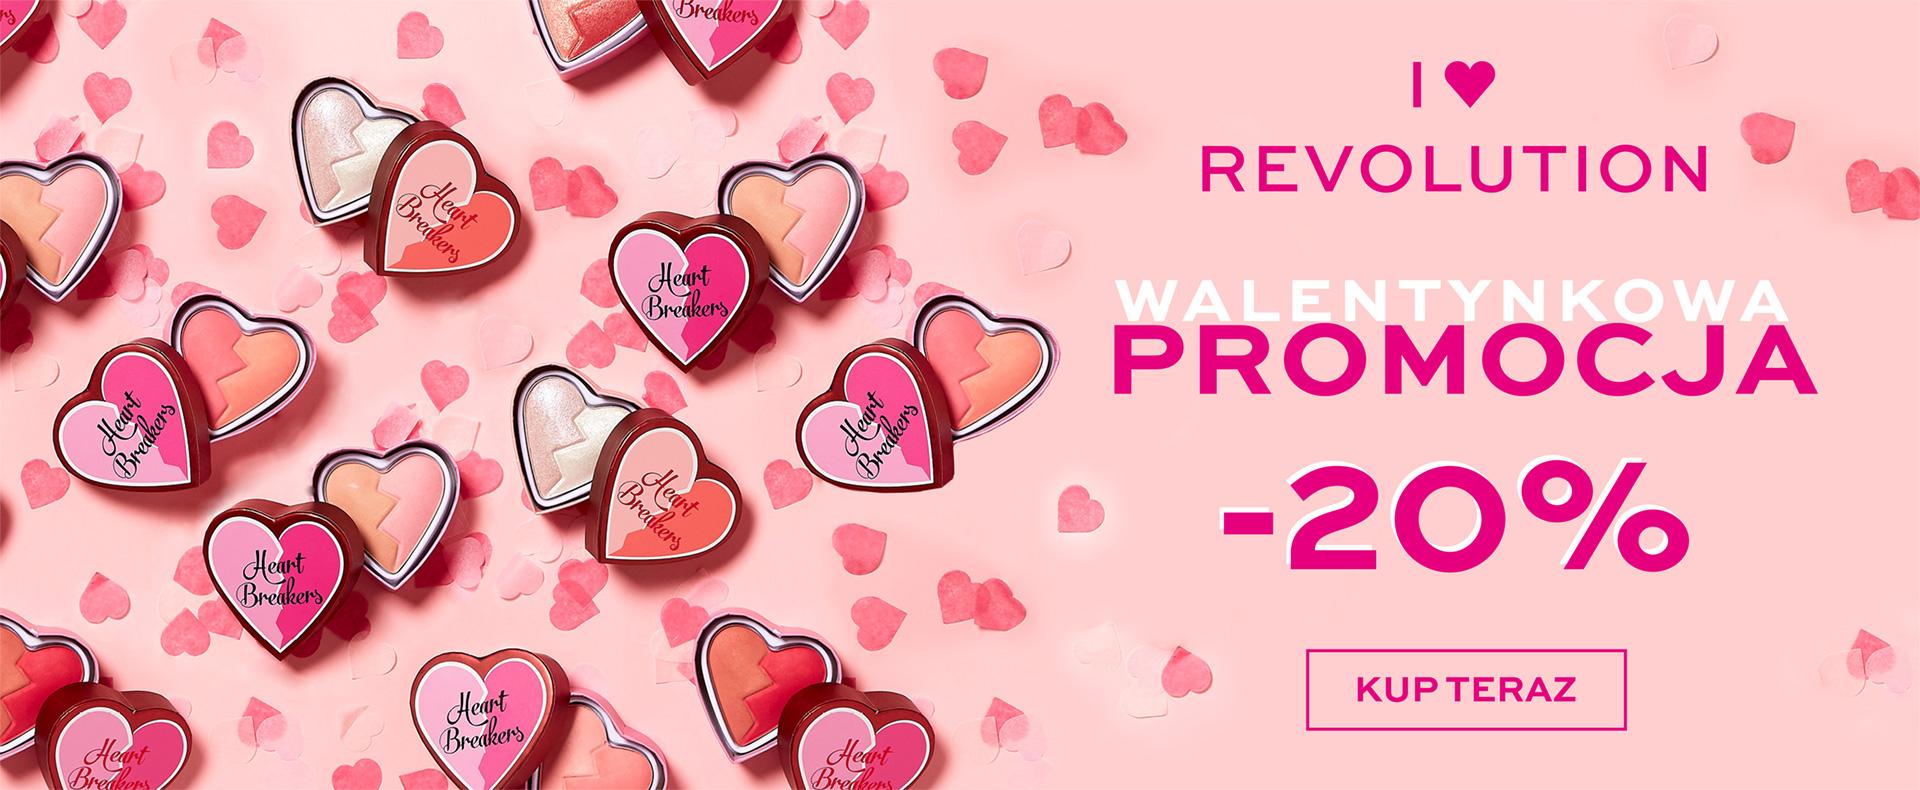 Ezebra: 20% rabatu na kosmetyki marki I Love Revolution